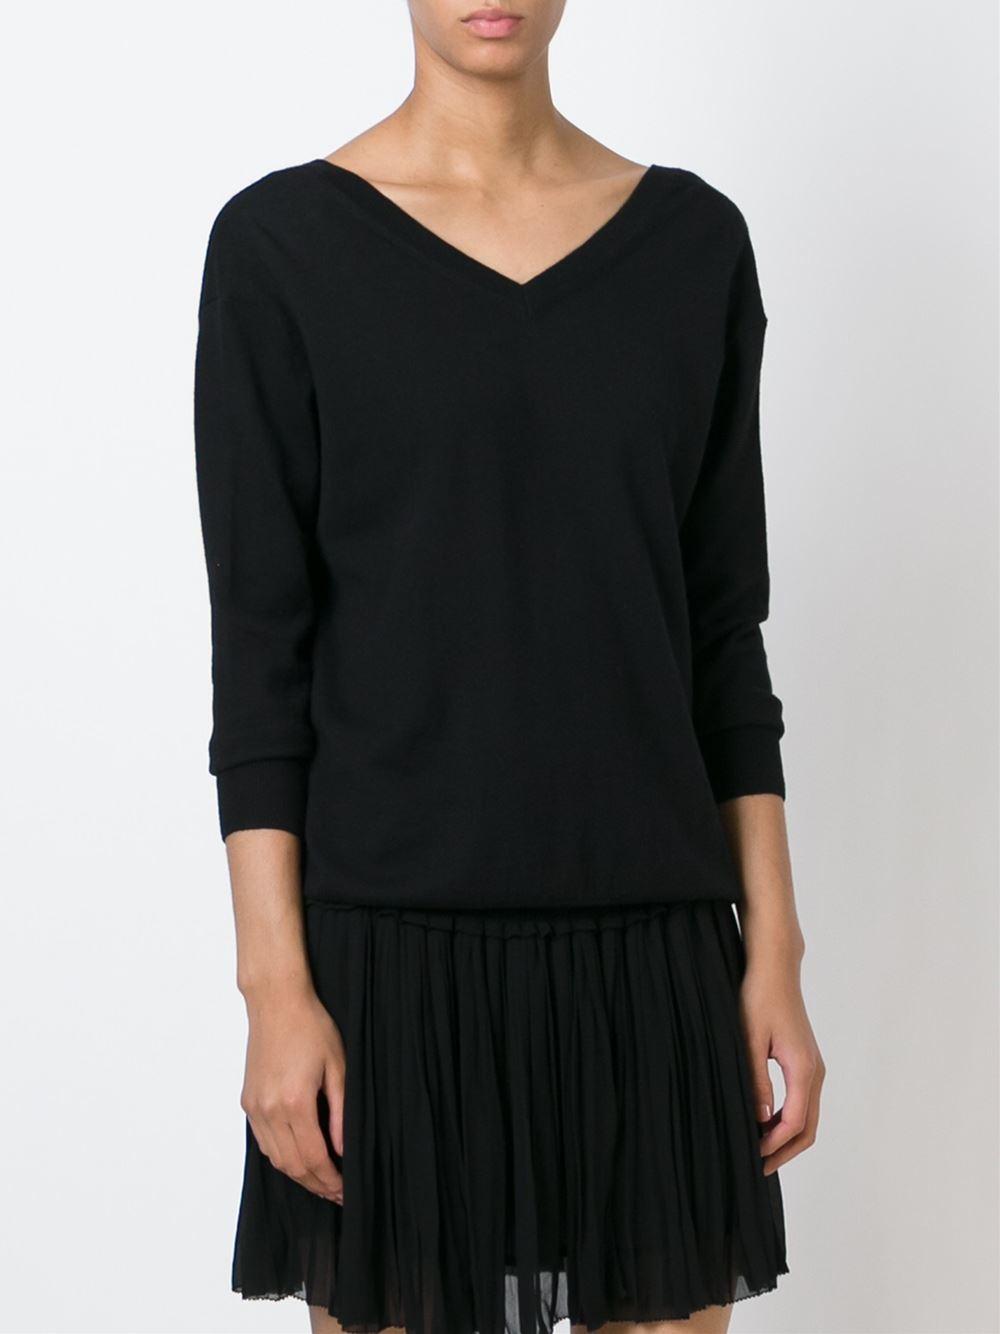 toile isabel marant 39 kinsey 39 sweater in black lyst. Black Bedroom Furniture Sets. Home Design Ideas